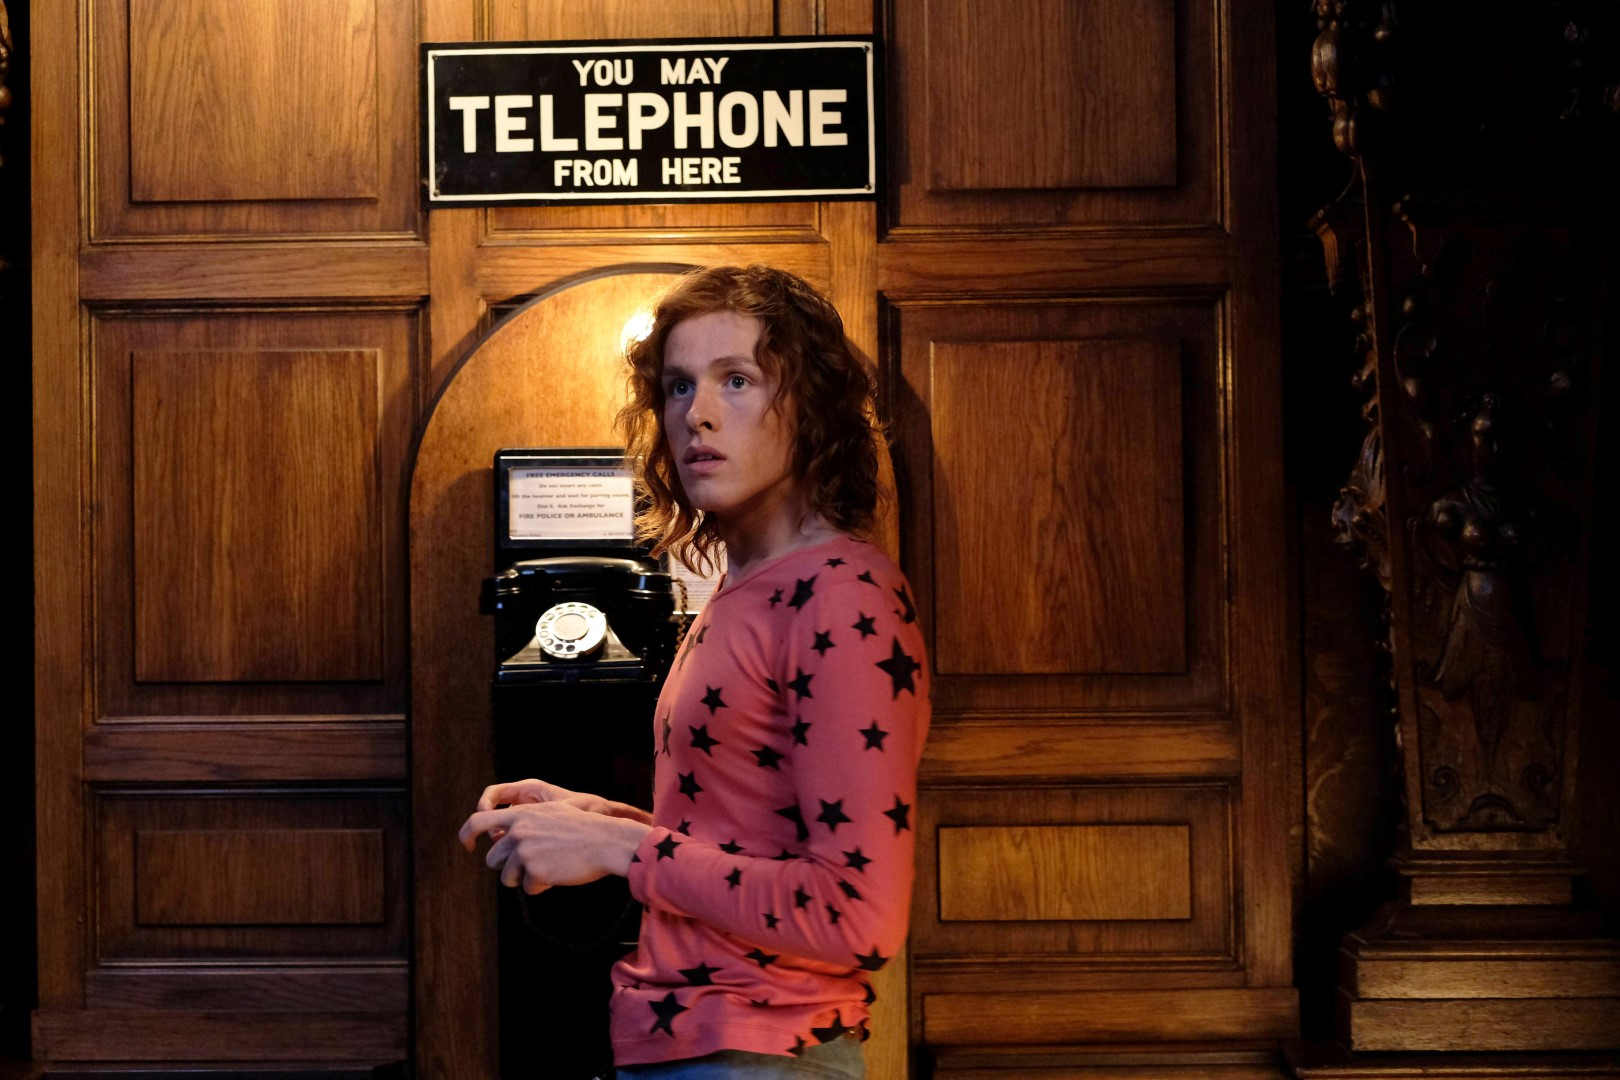 'Trust': Tráiler de la nueva serie de HBO con Donald Sutherland, Hilary Swank y Brendan Fraser